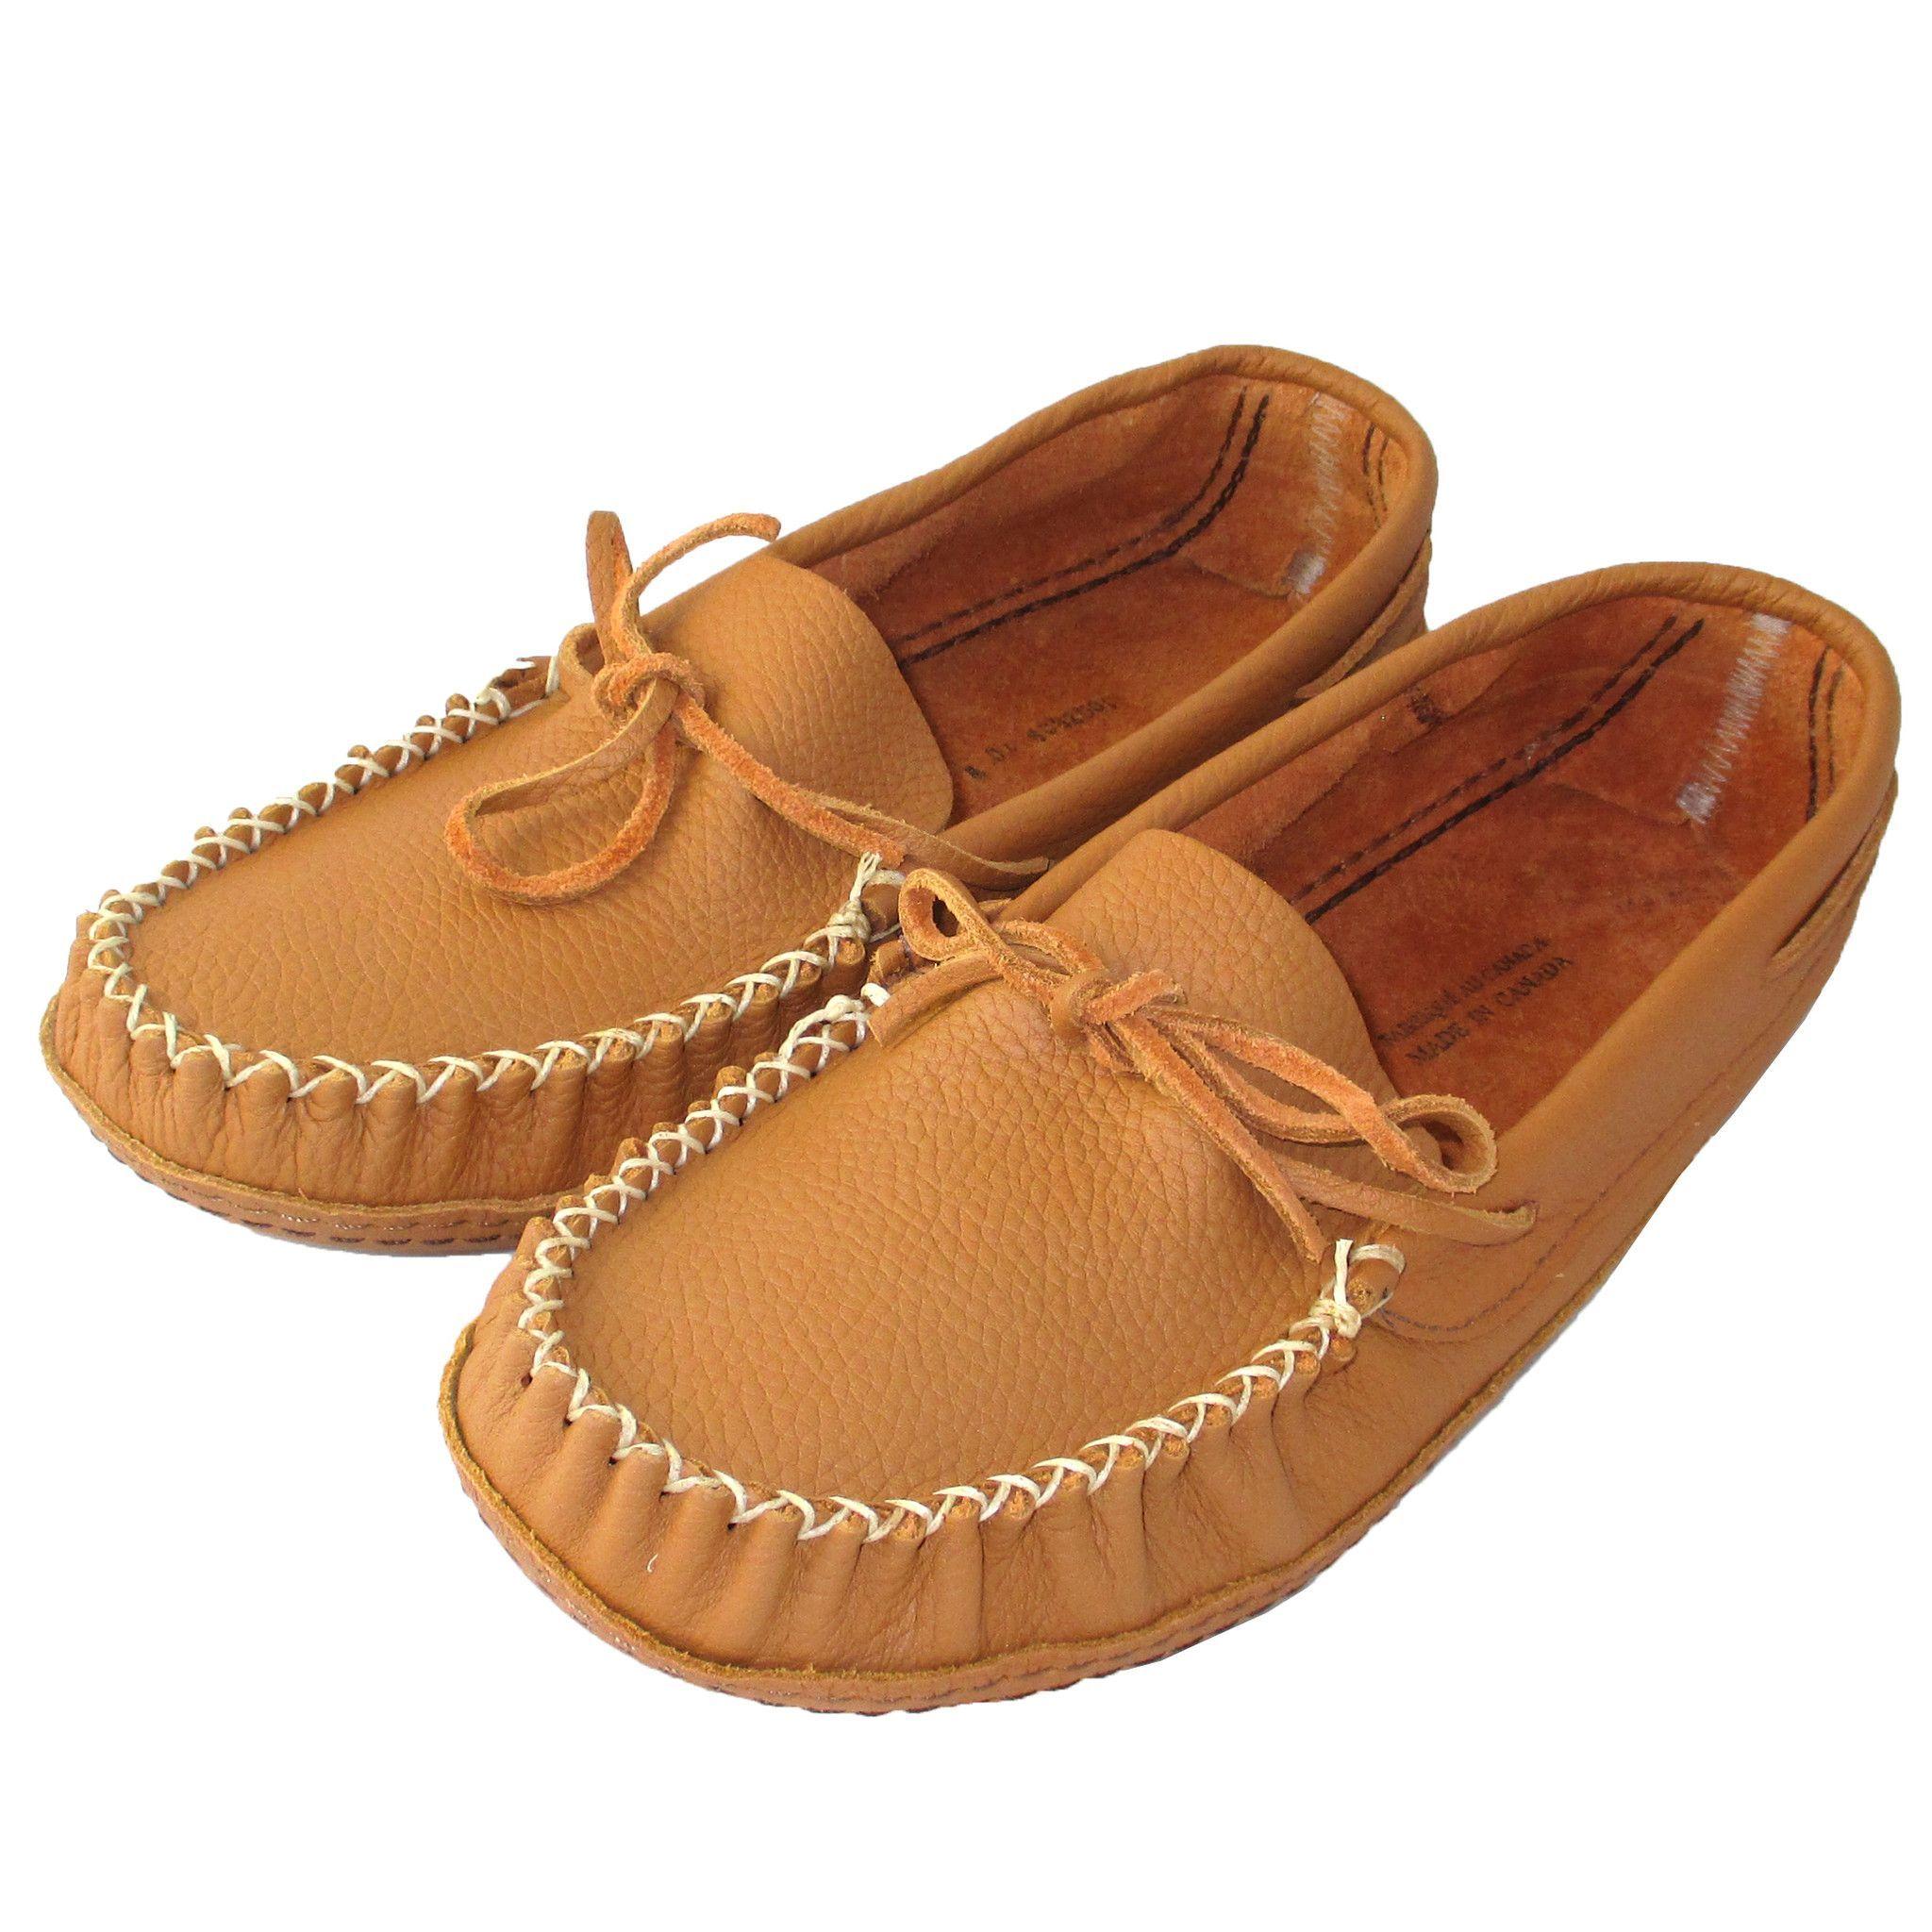 Men's Wide Width Soft Sole Leather